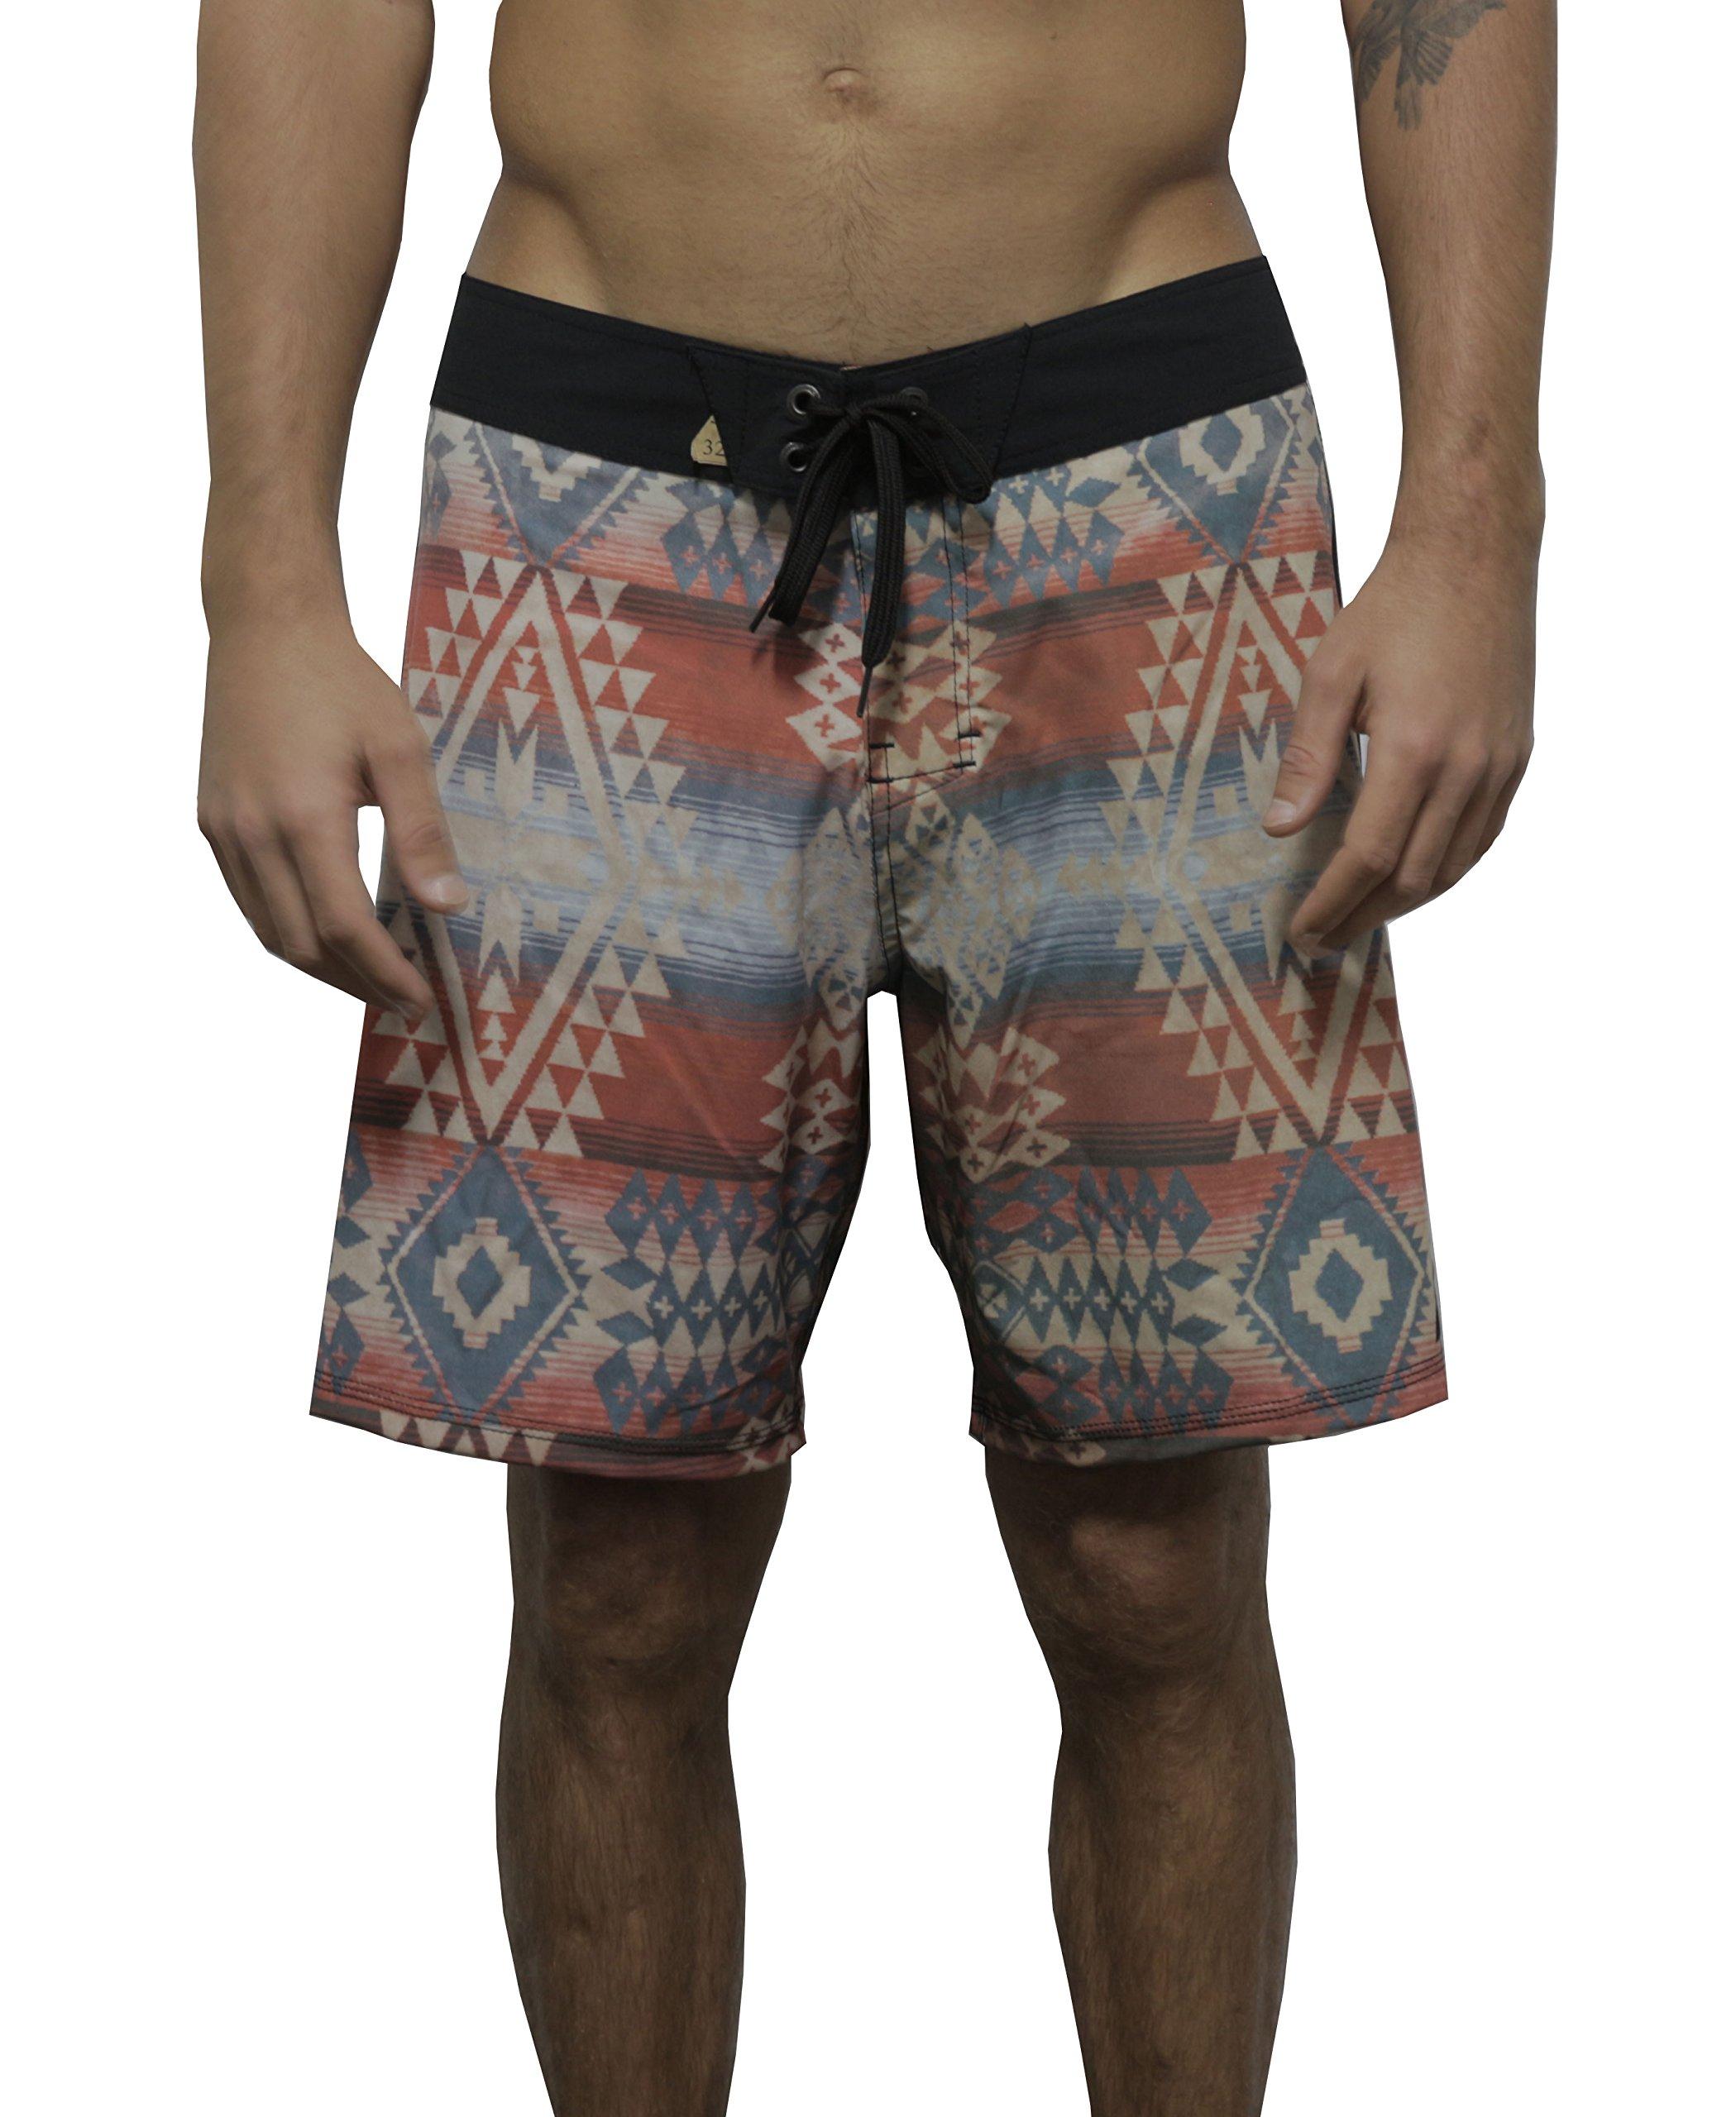 Psychodelic Men Stretch Swim Quick Dry Water Beach Summer Board Short Trunk Multicolor (34-35)